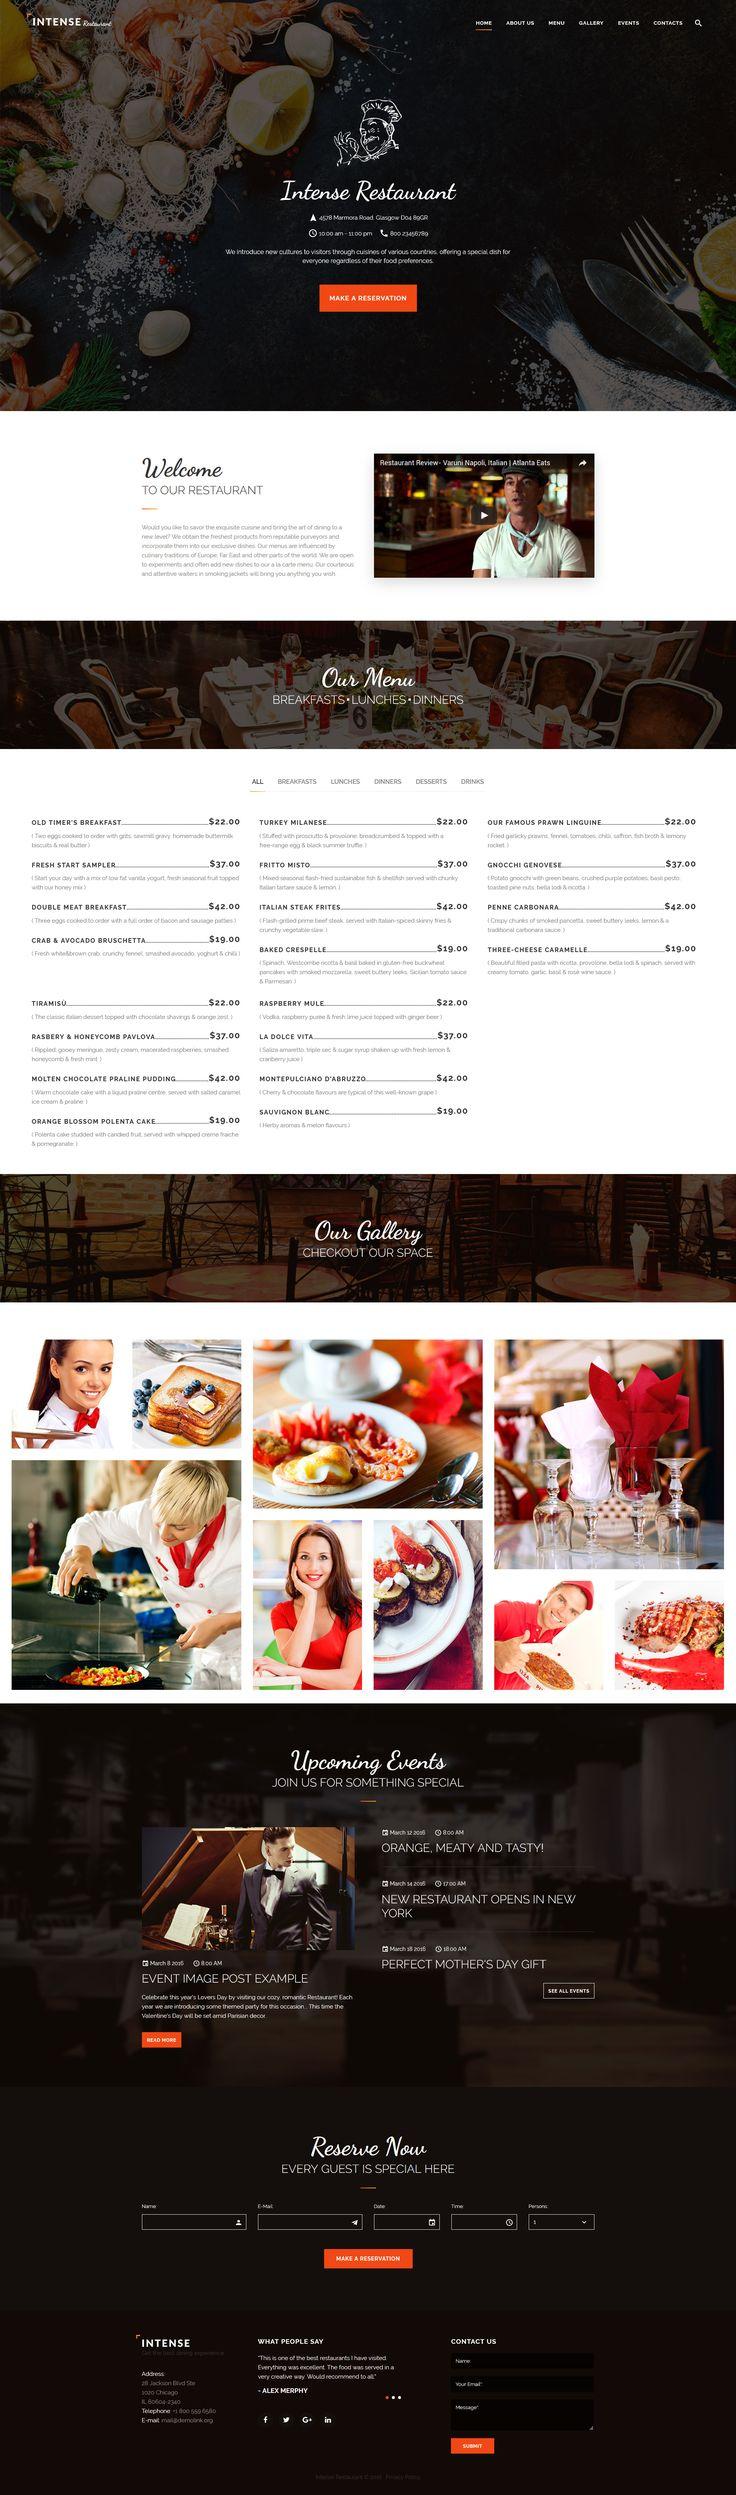 INTENSE Restaurant Website Template 578 best Templtes